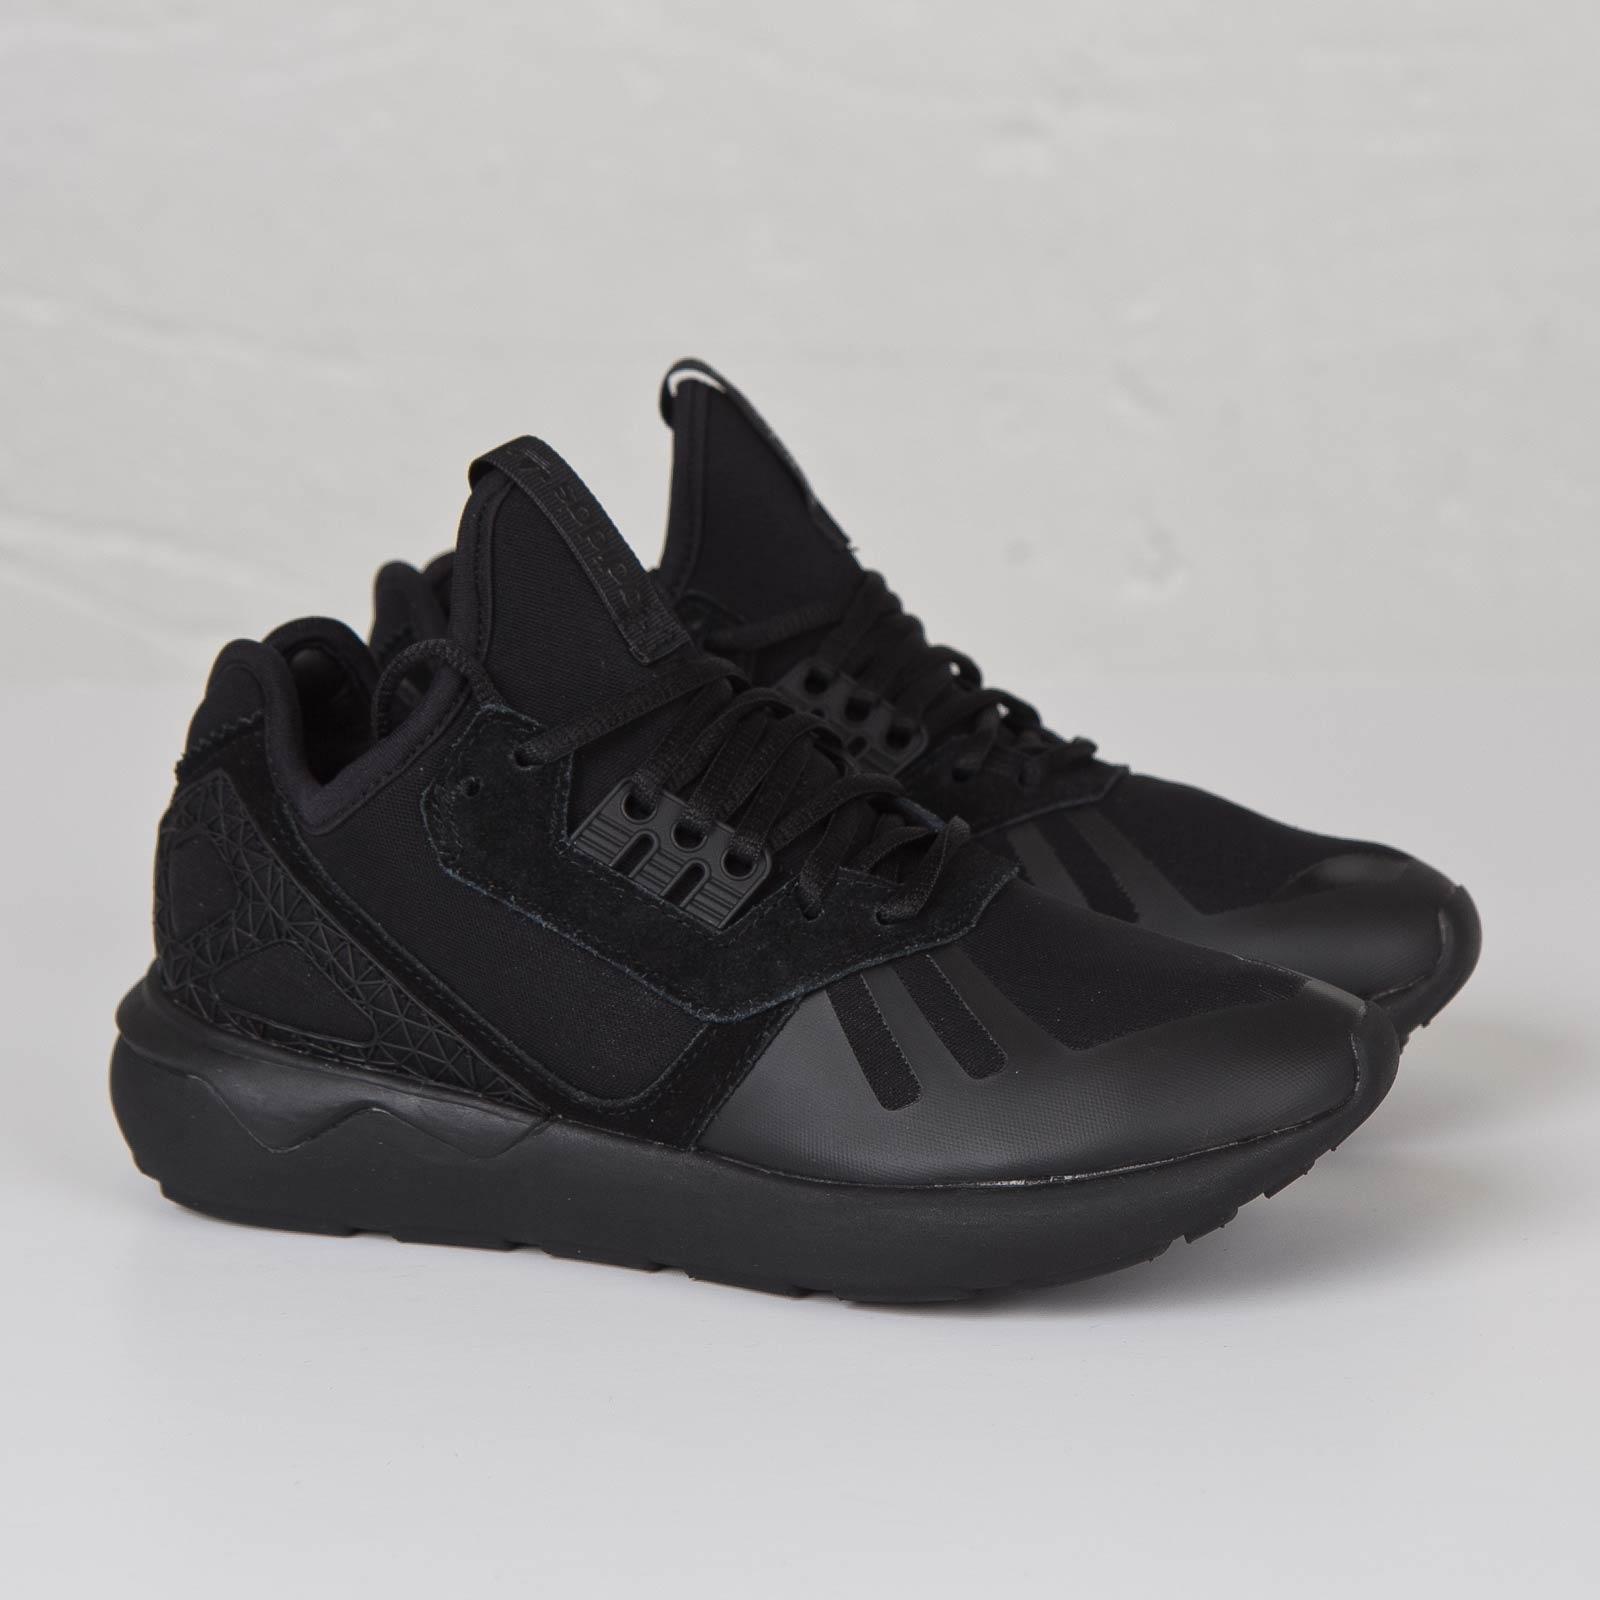 size 40 425b3 31ae8 adidas Tubular Runner W - S81264 - Sneakersnstuff | sneakers ...